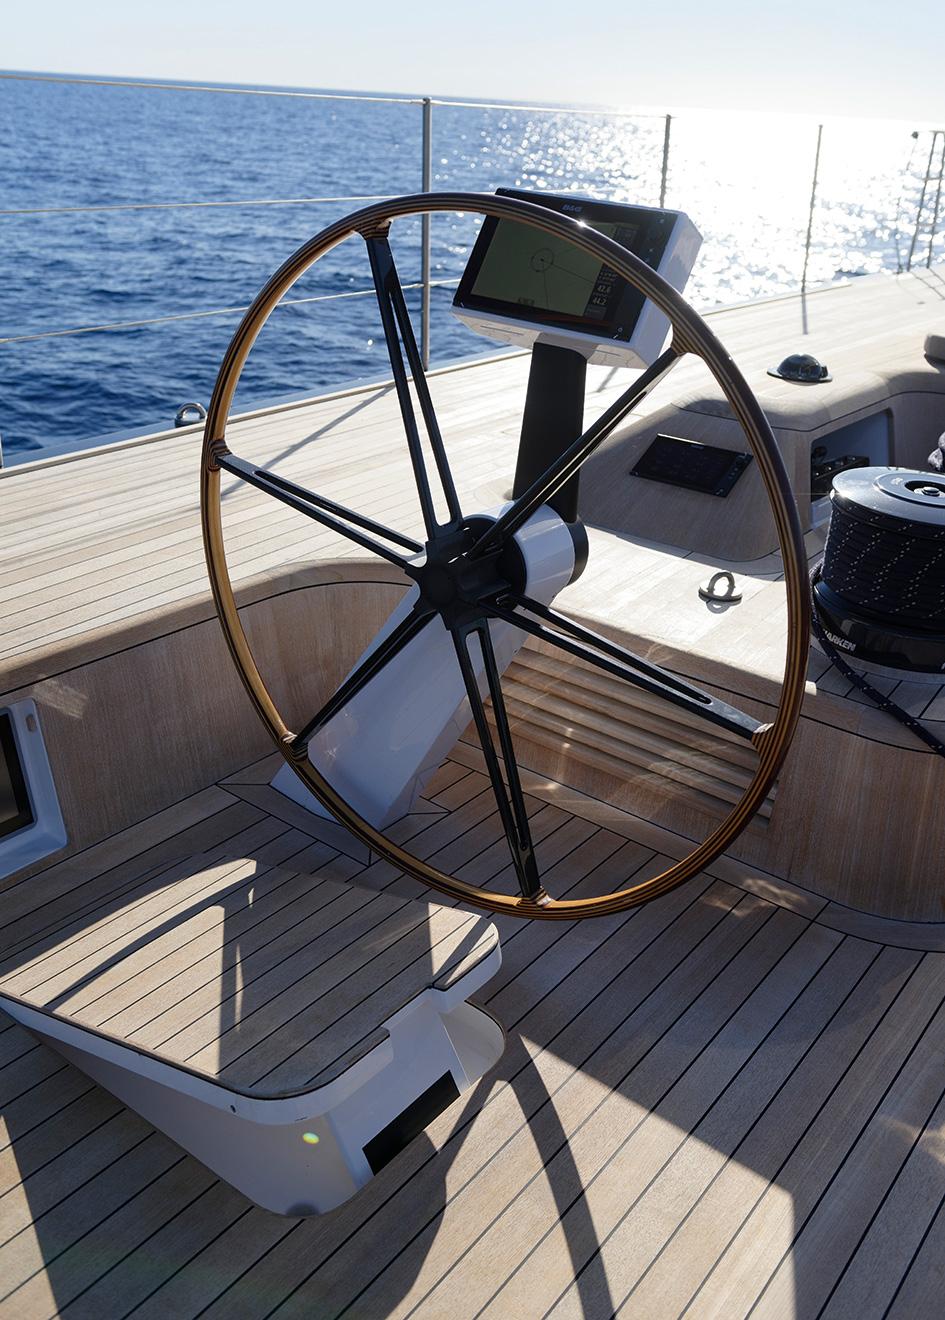 the-helm-of-the-wally-110-sailing-yacht-barong-d-credit-kurt-arrigo